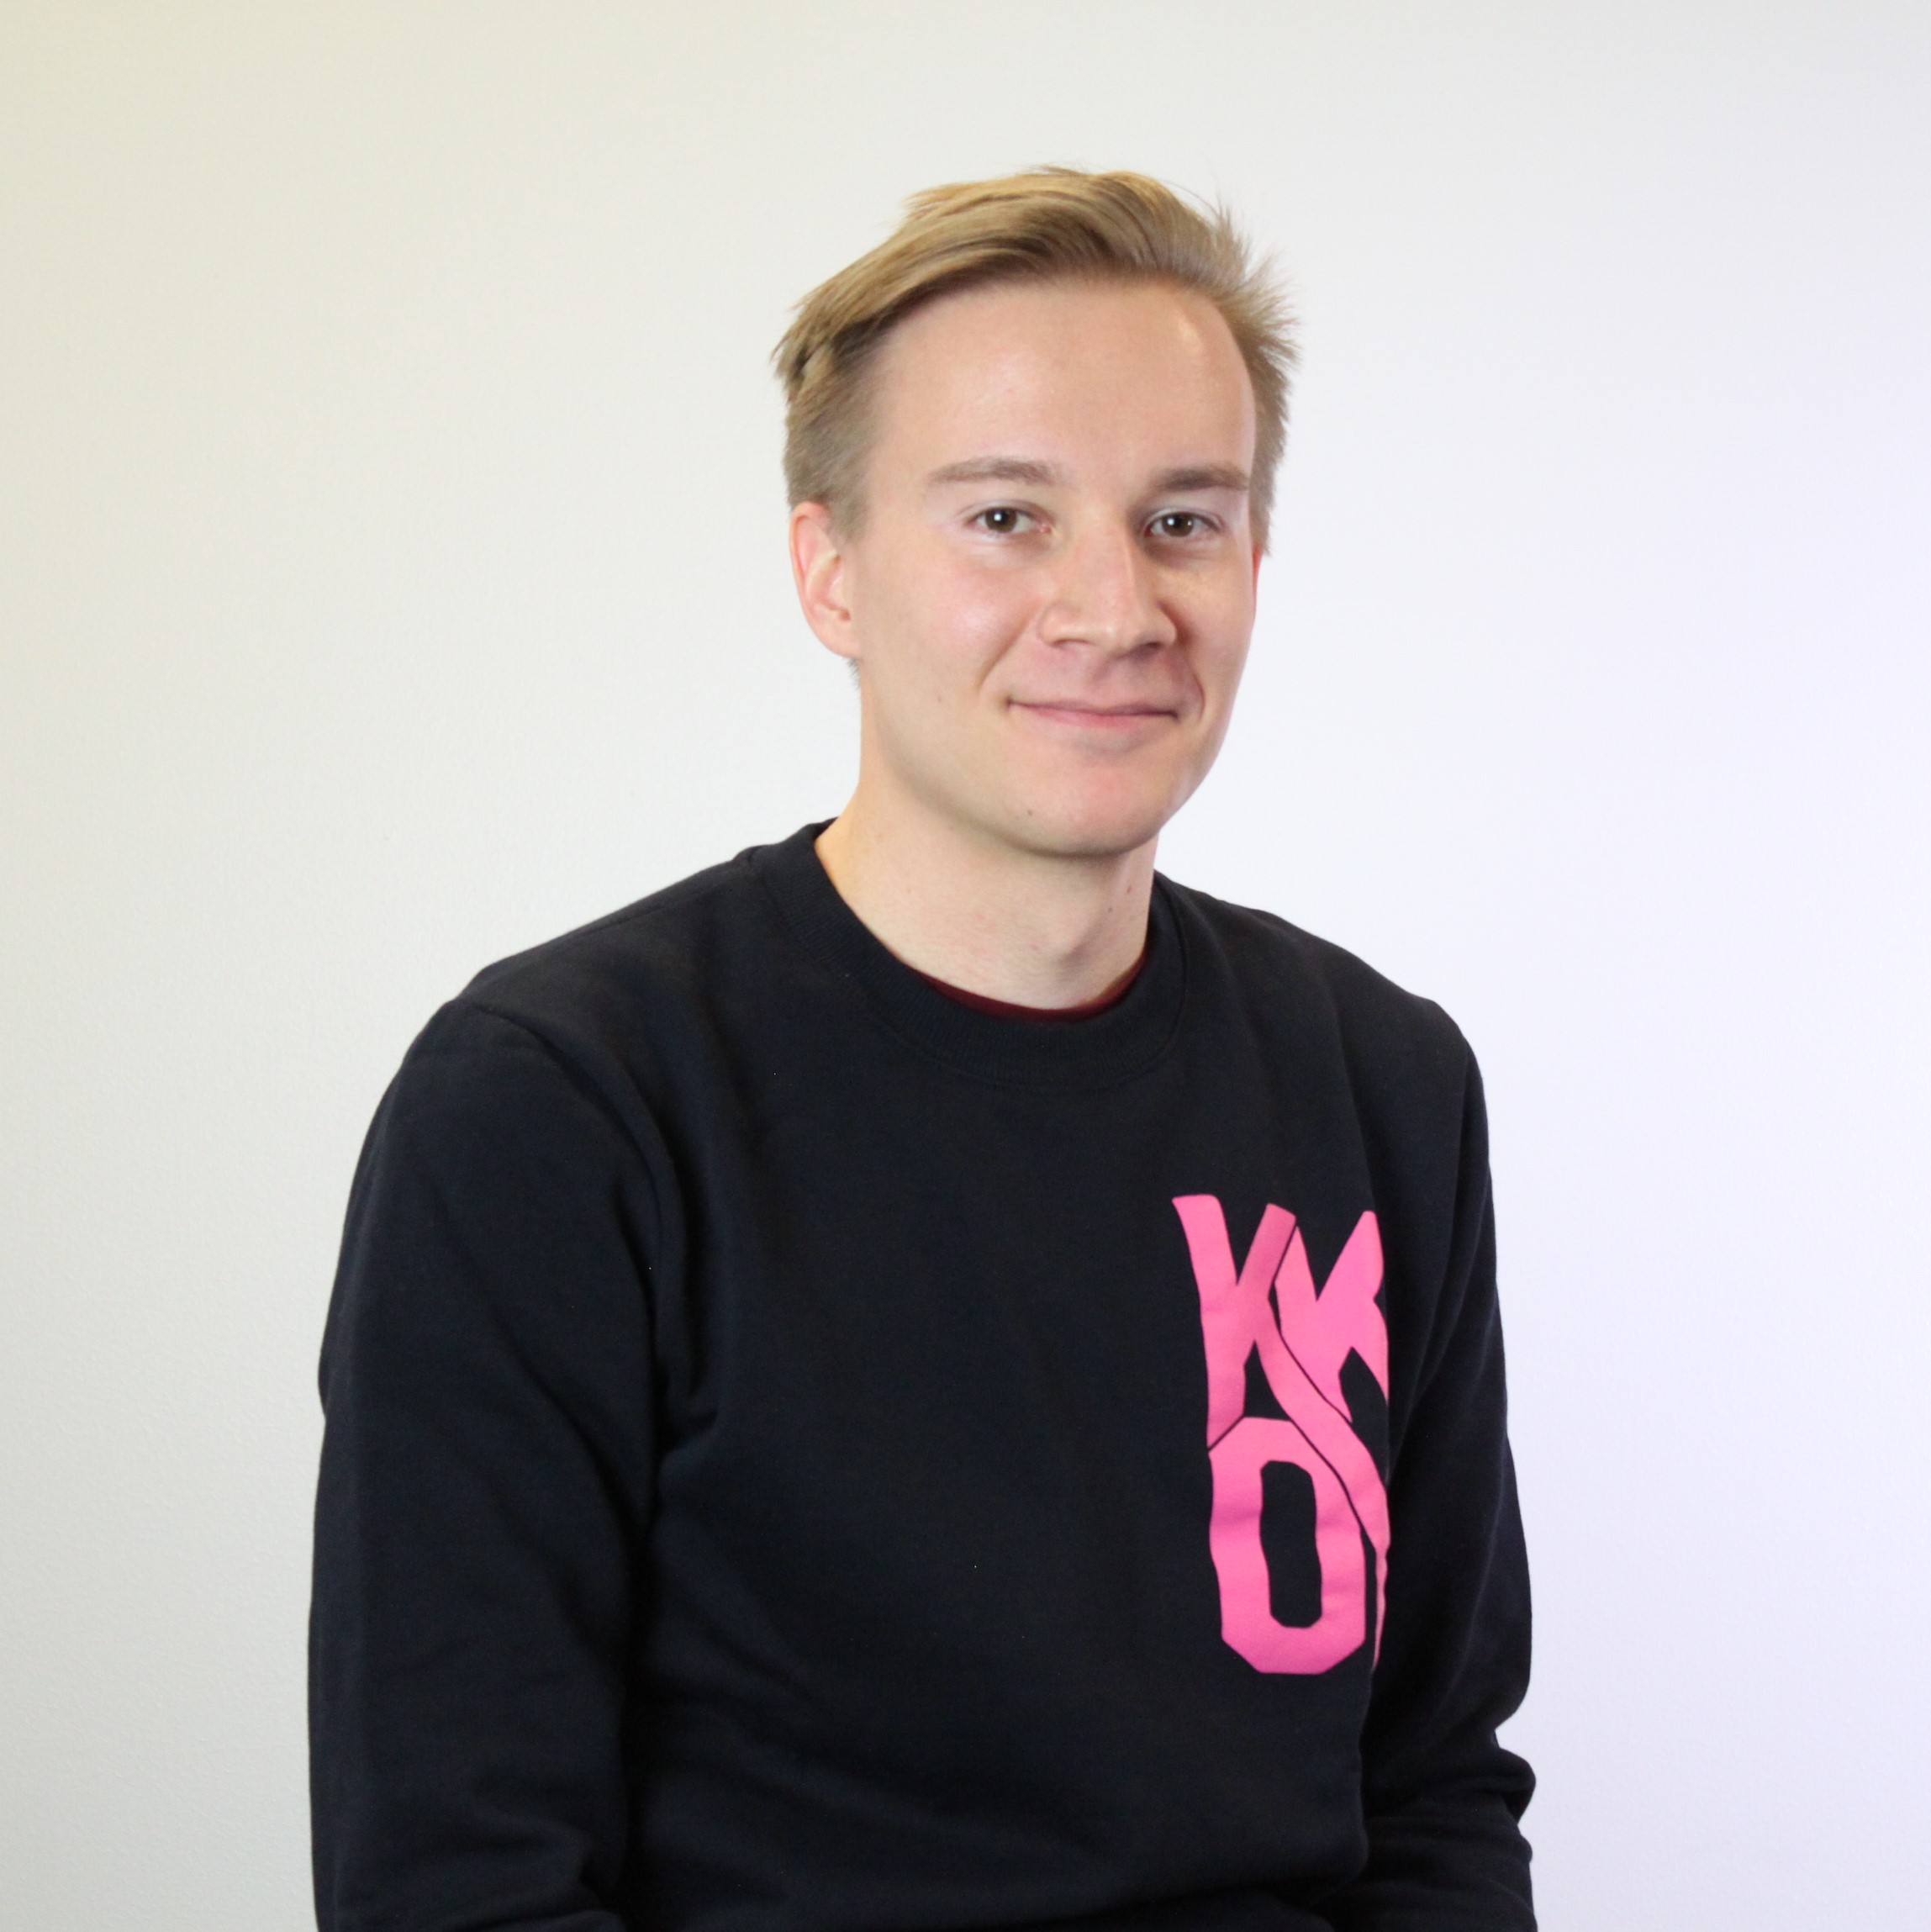 Miika Huhtanen